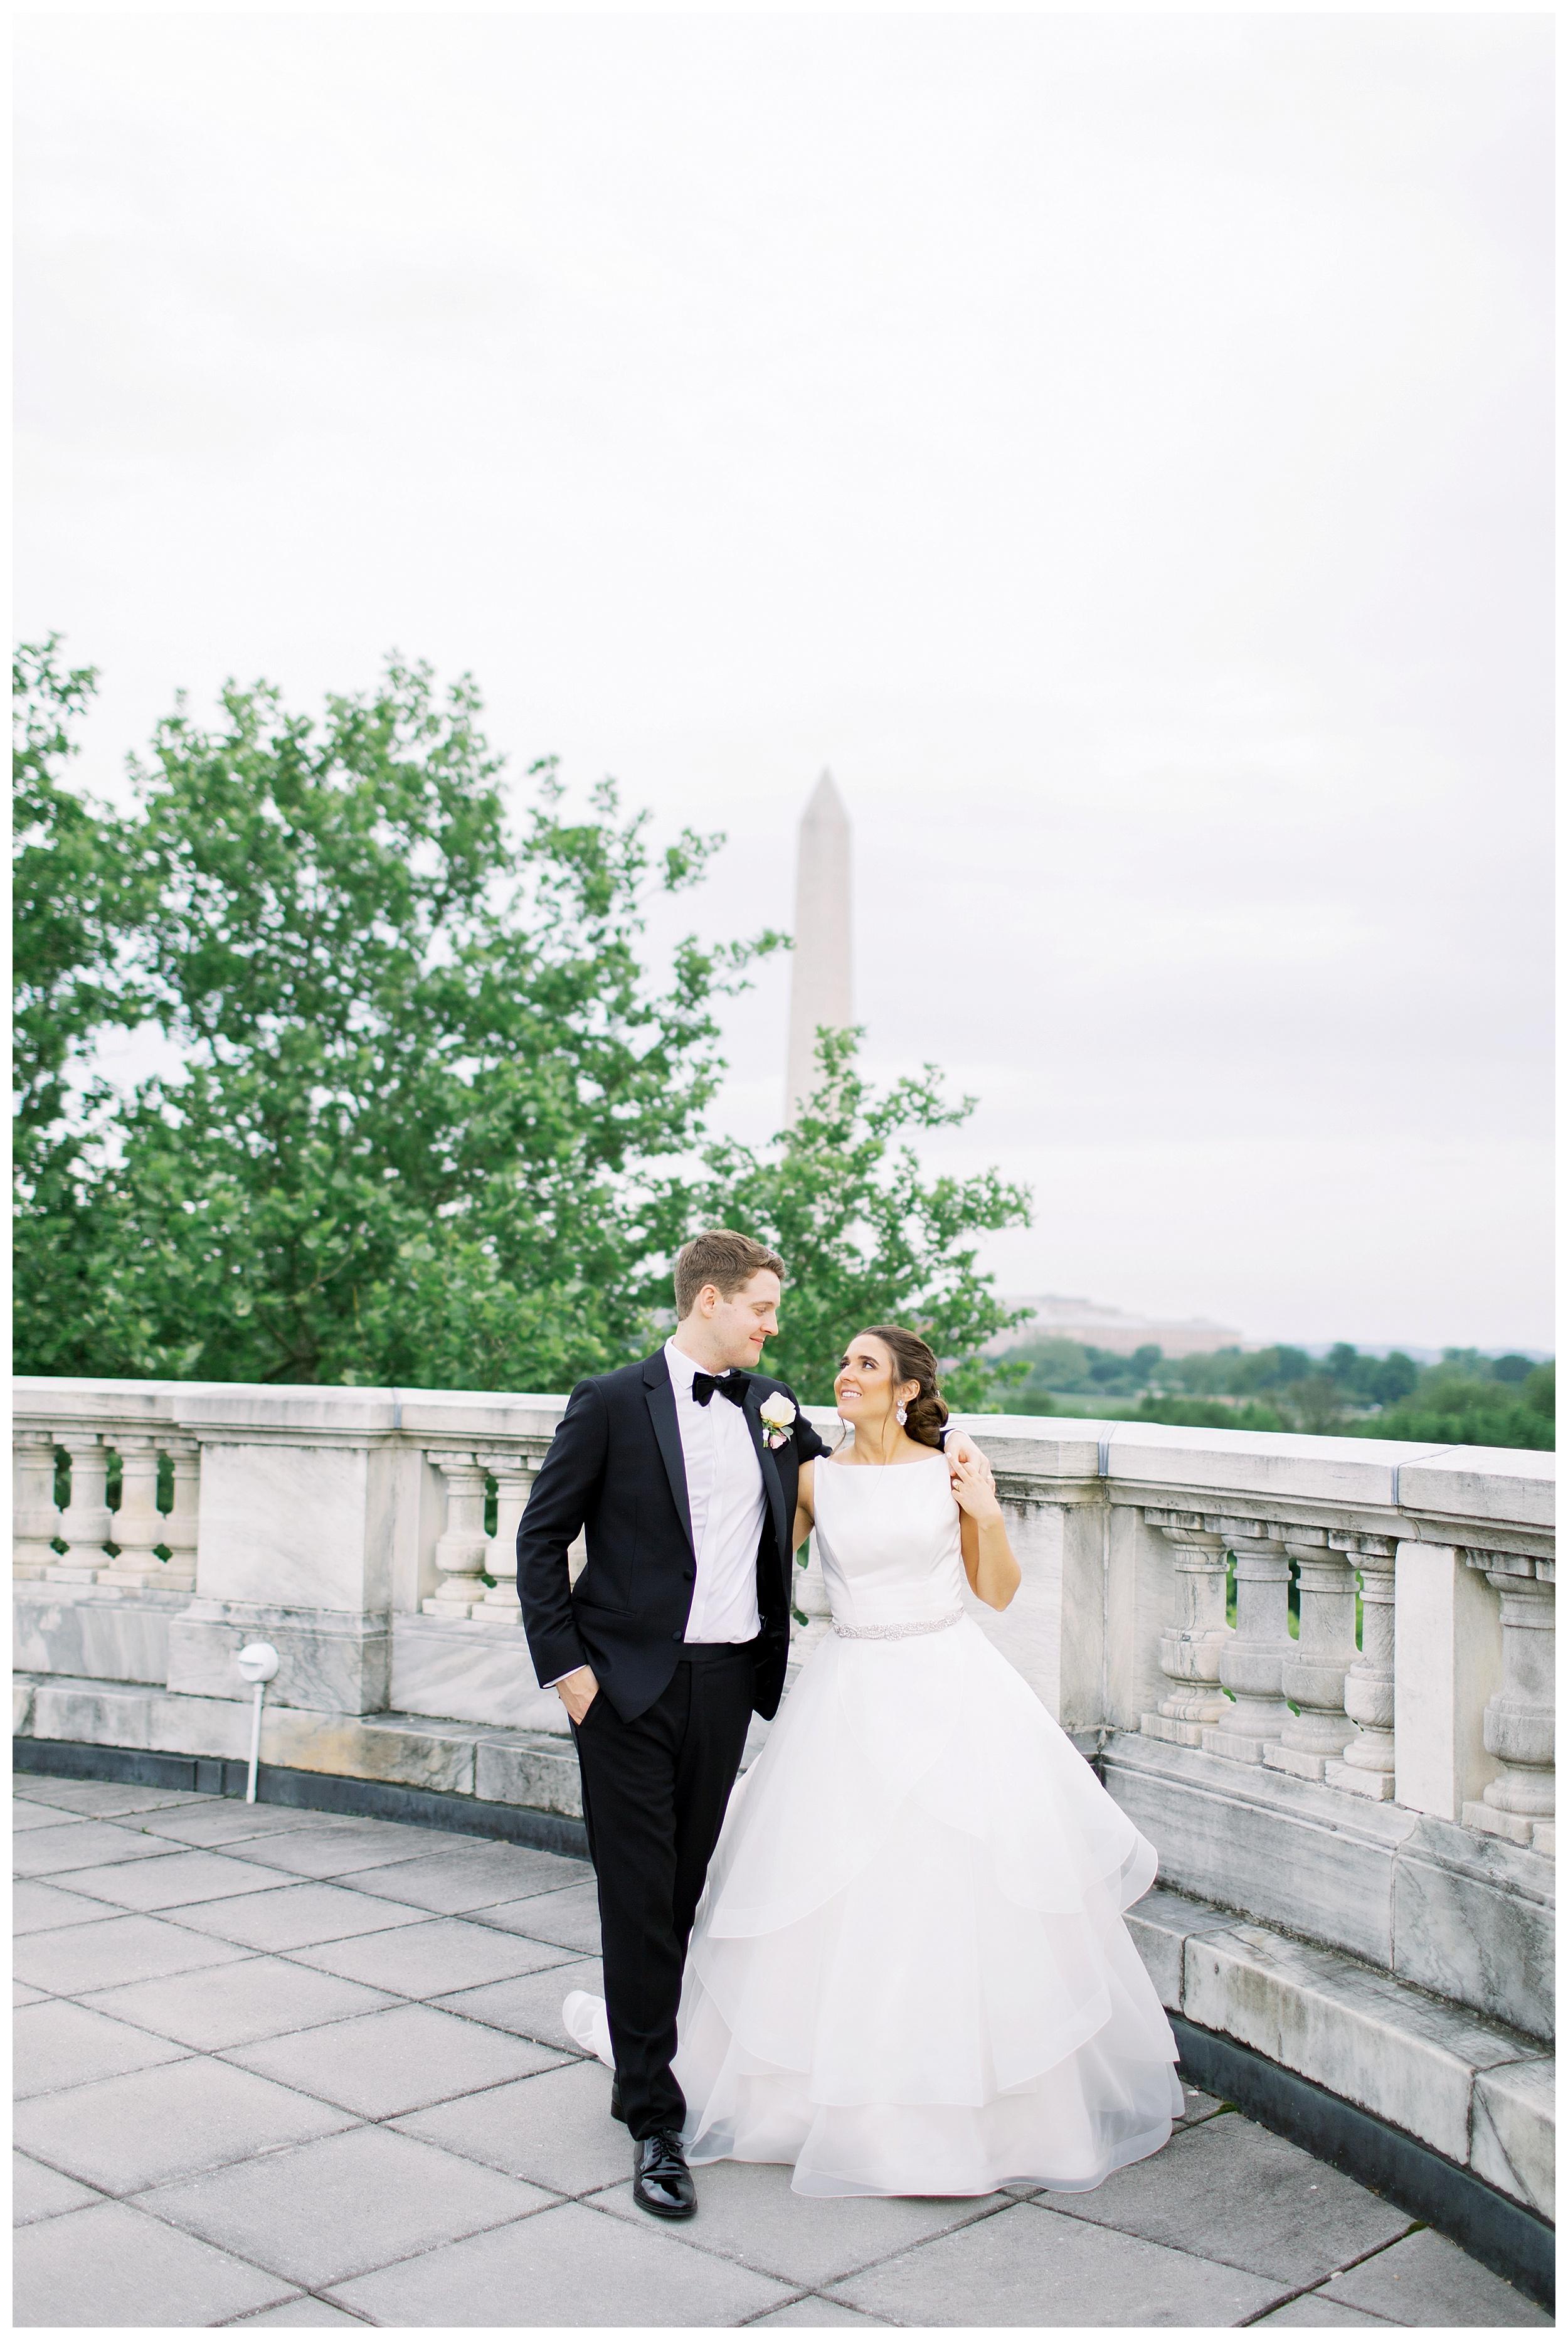 DAR Constitution Hall Wedding Wedding | Daughters of the American Revolution Wedding | District of Columbia Film Wedding Photographer Kir Tuben_0107.jpg